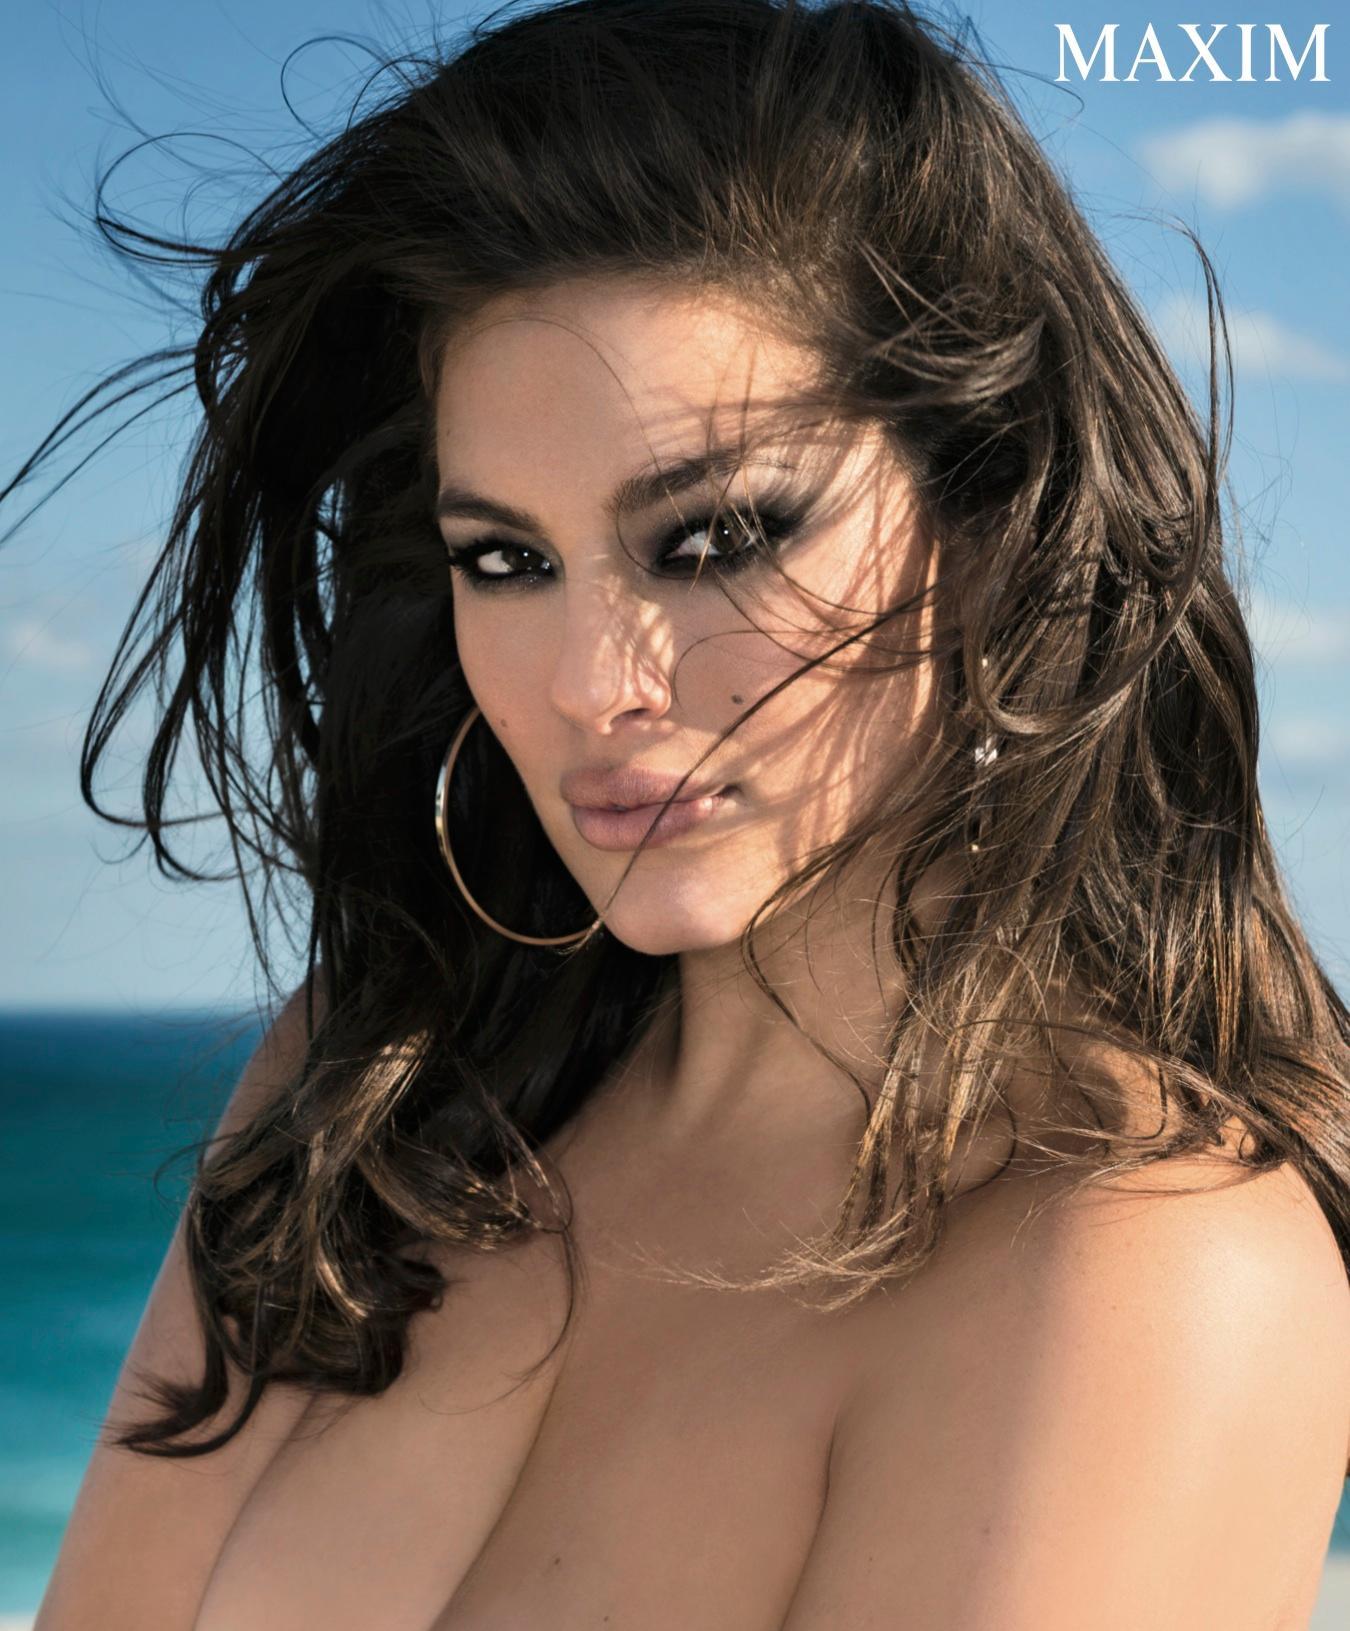 Ashley Graham Maxim April 2016 Img Models